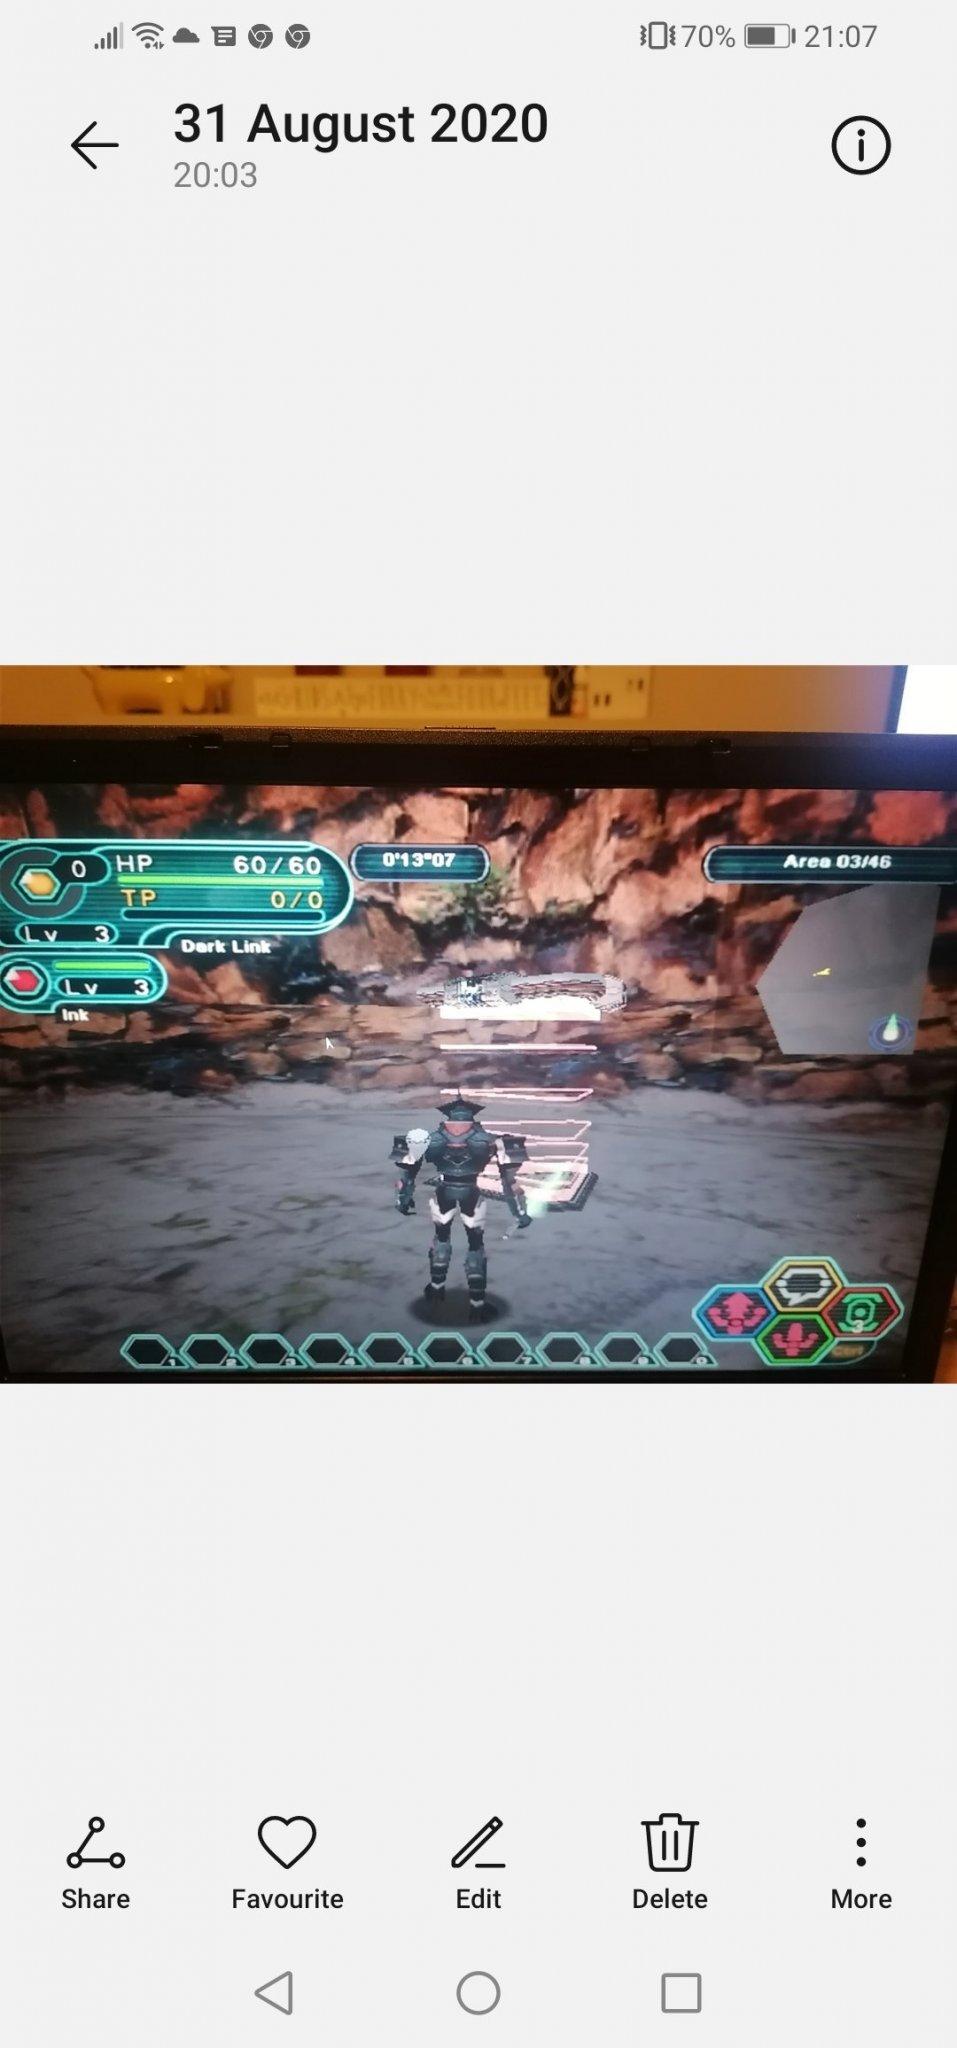 Screenshot_20200831_210714_com.android.gallery3d.jpg